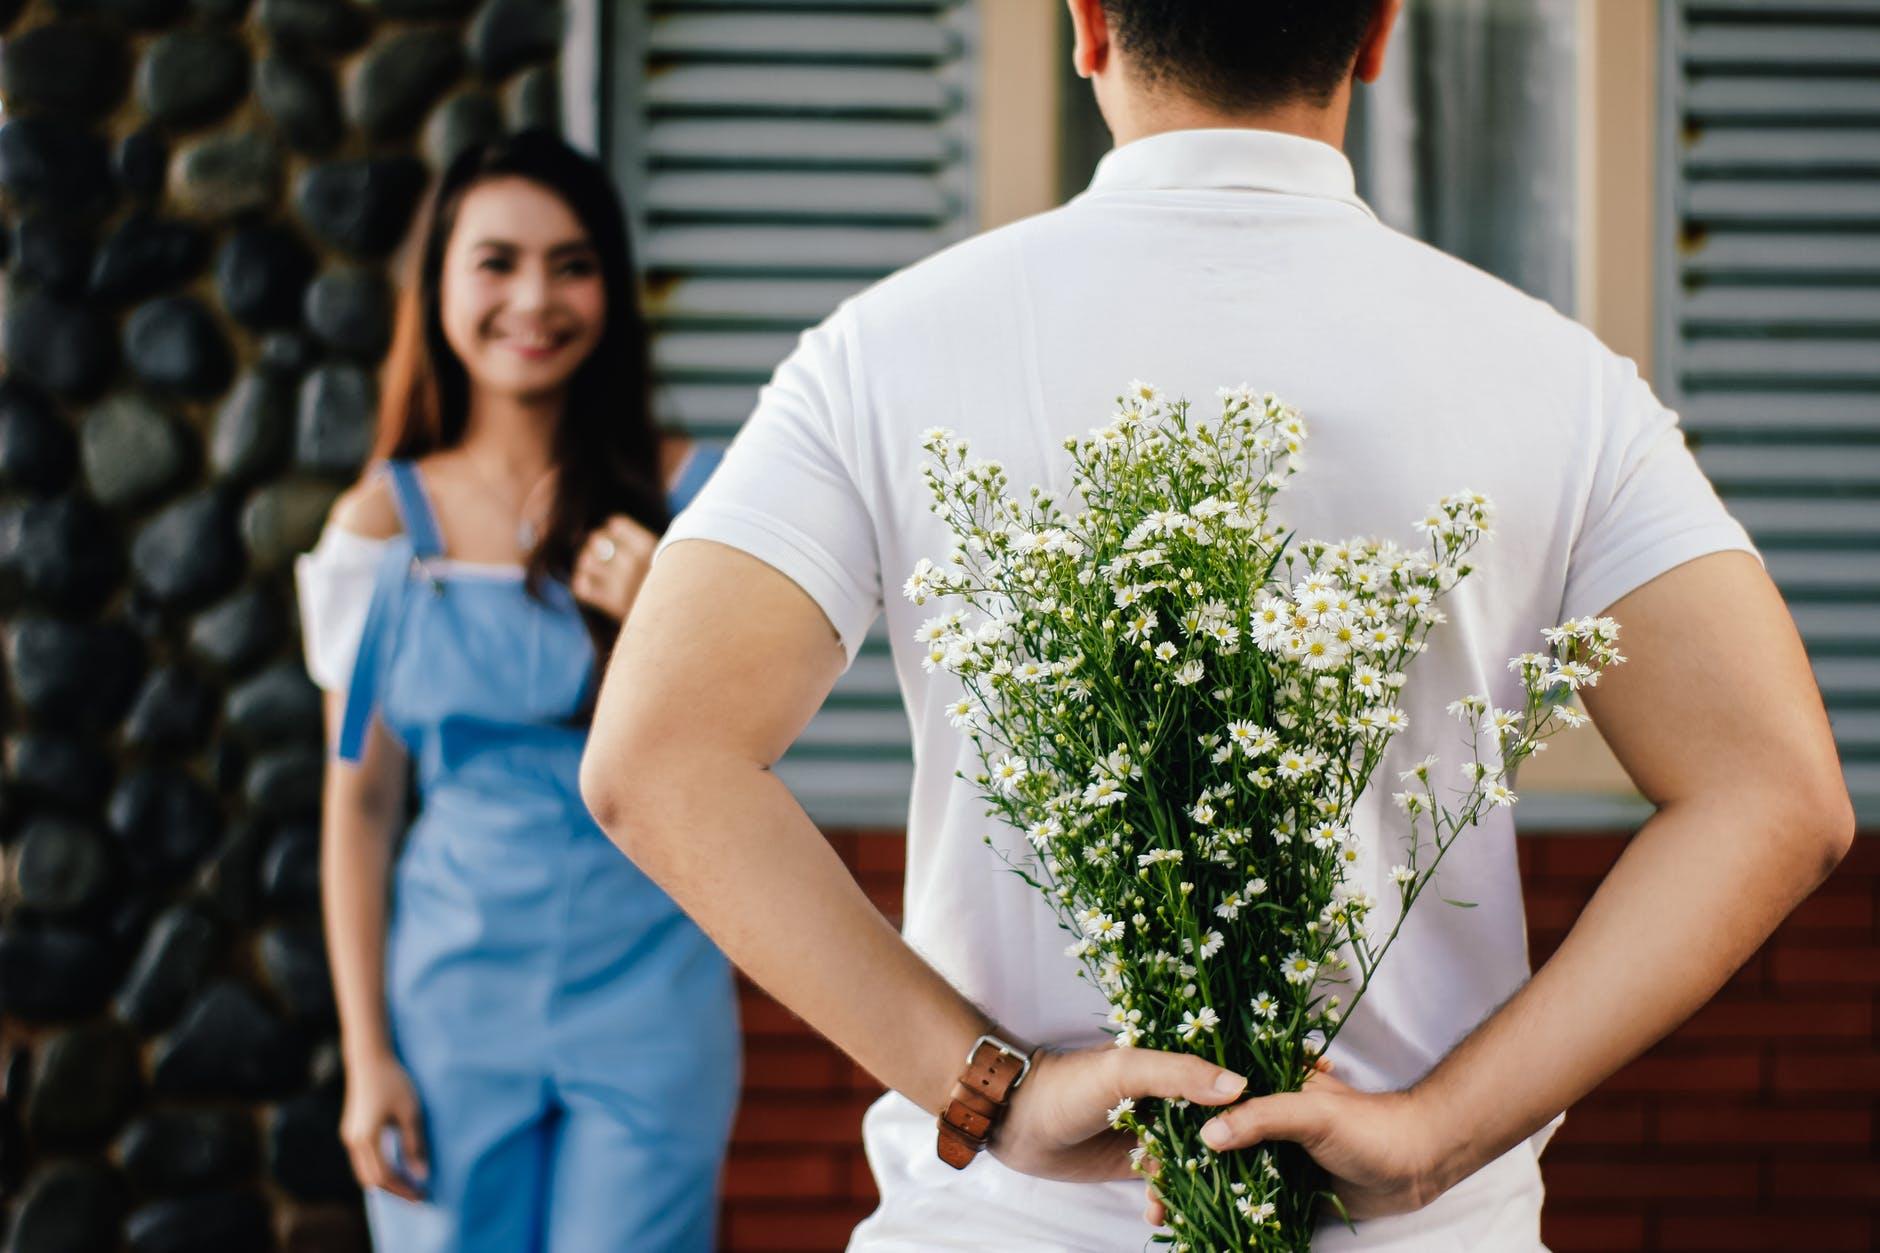 Tips for relationships